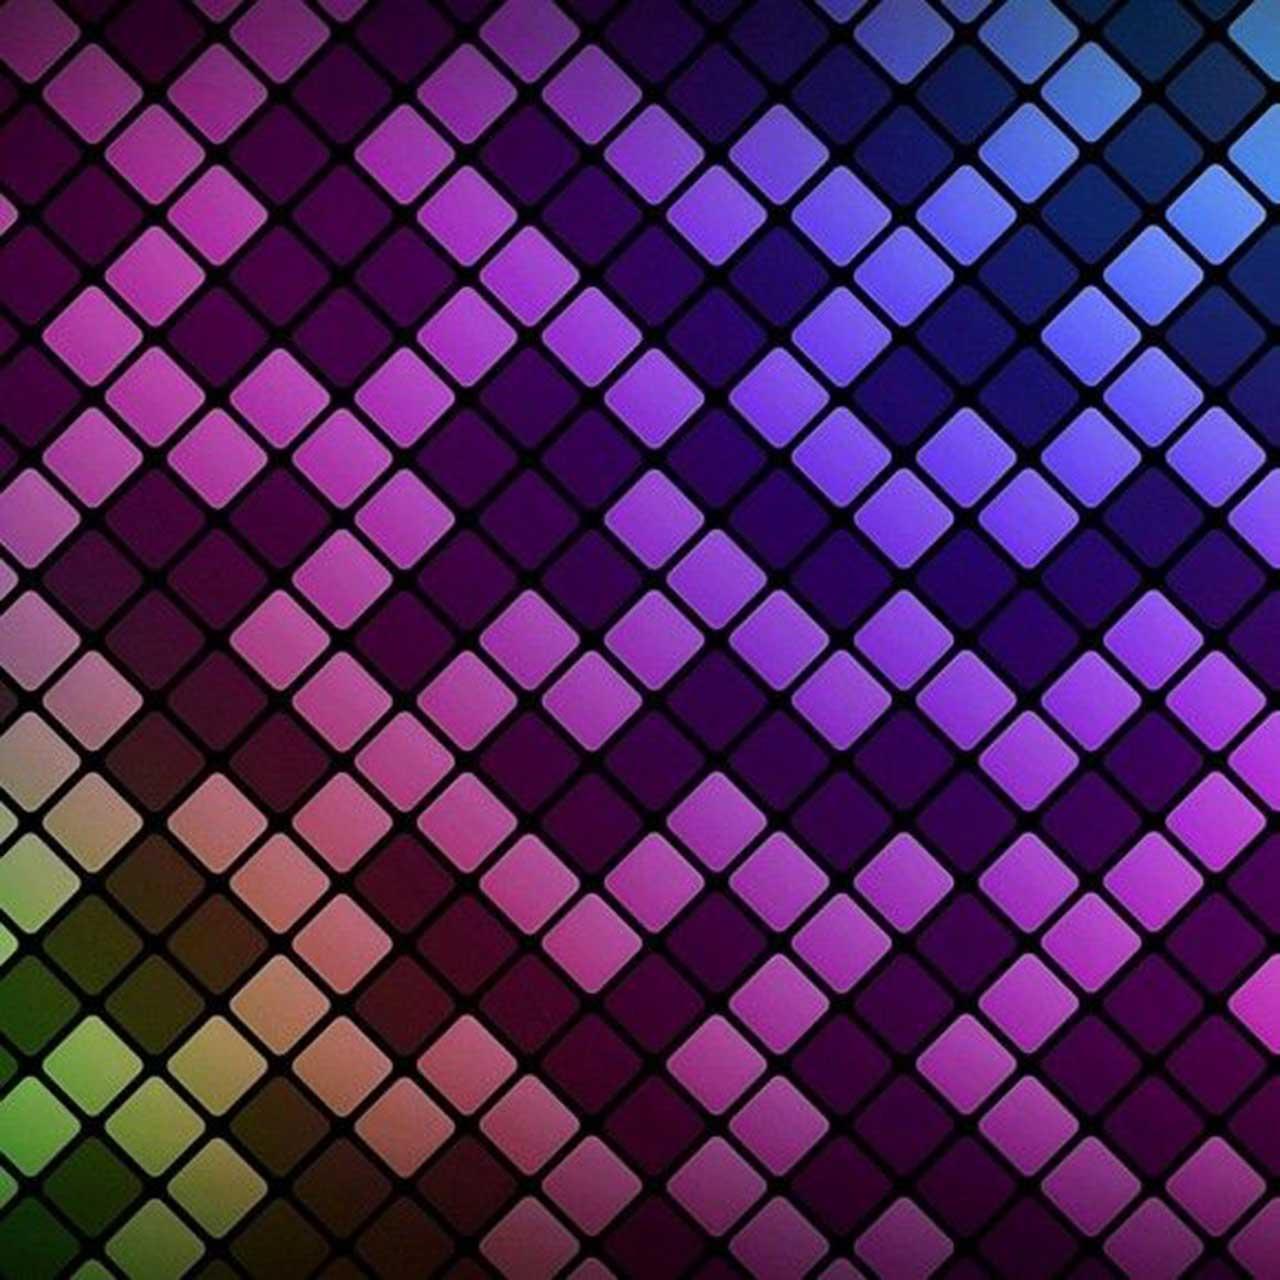 Tetris Pattern Wallpaper